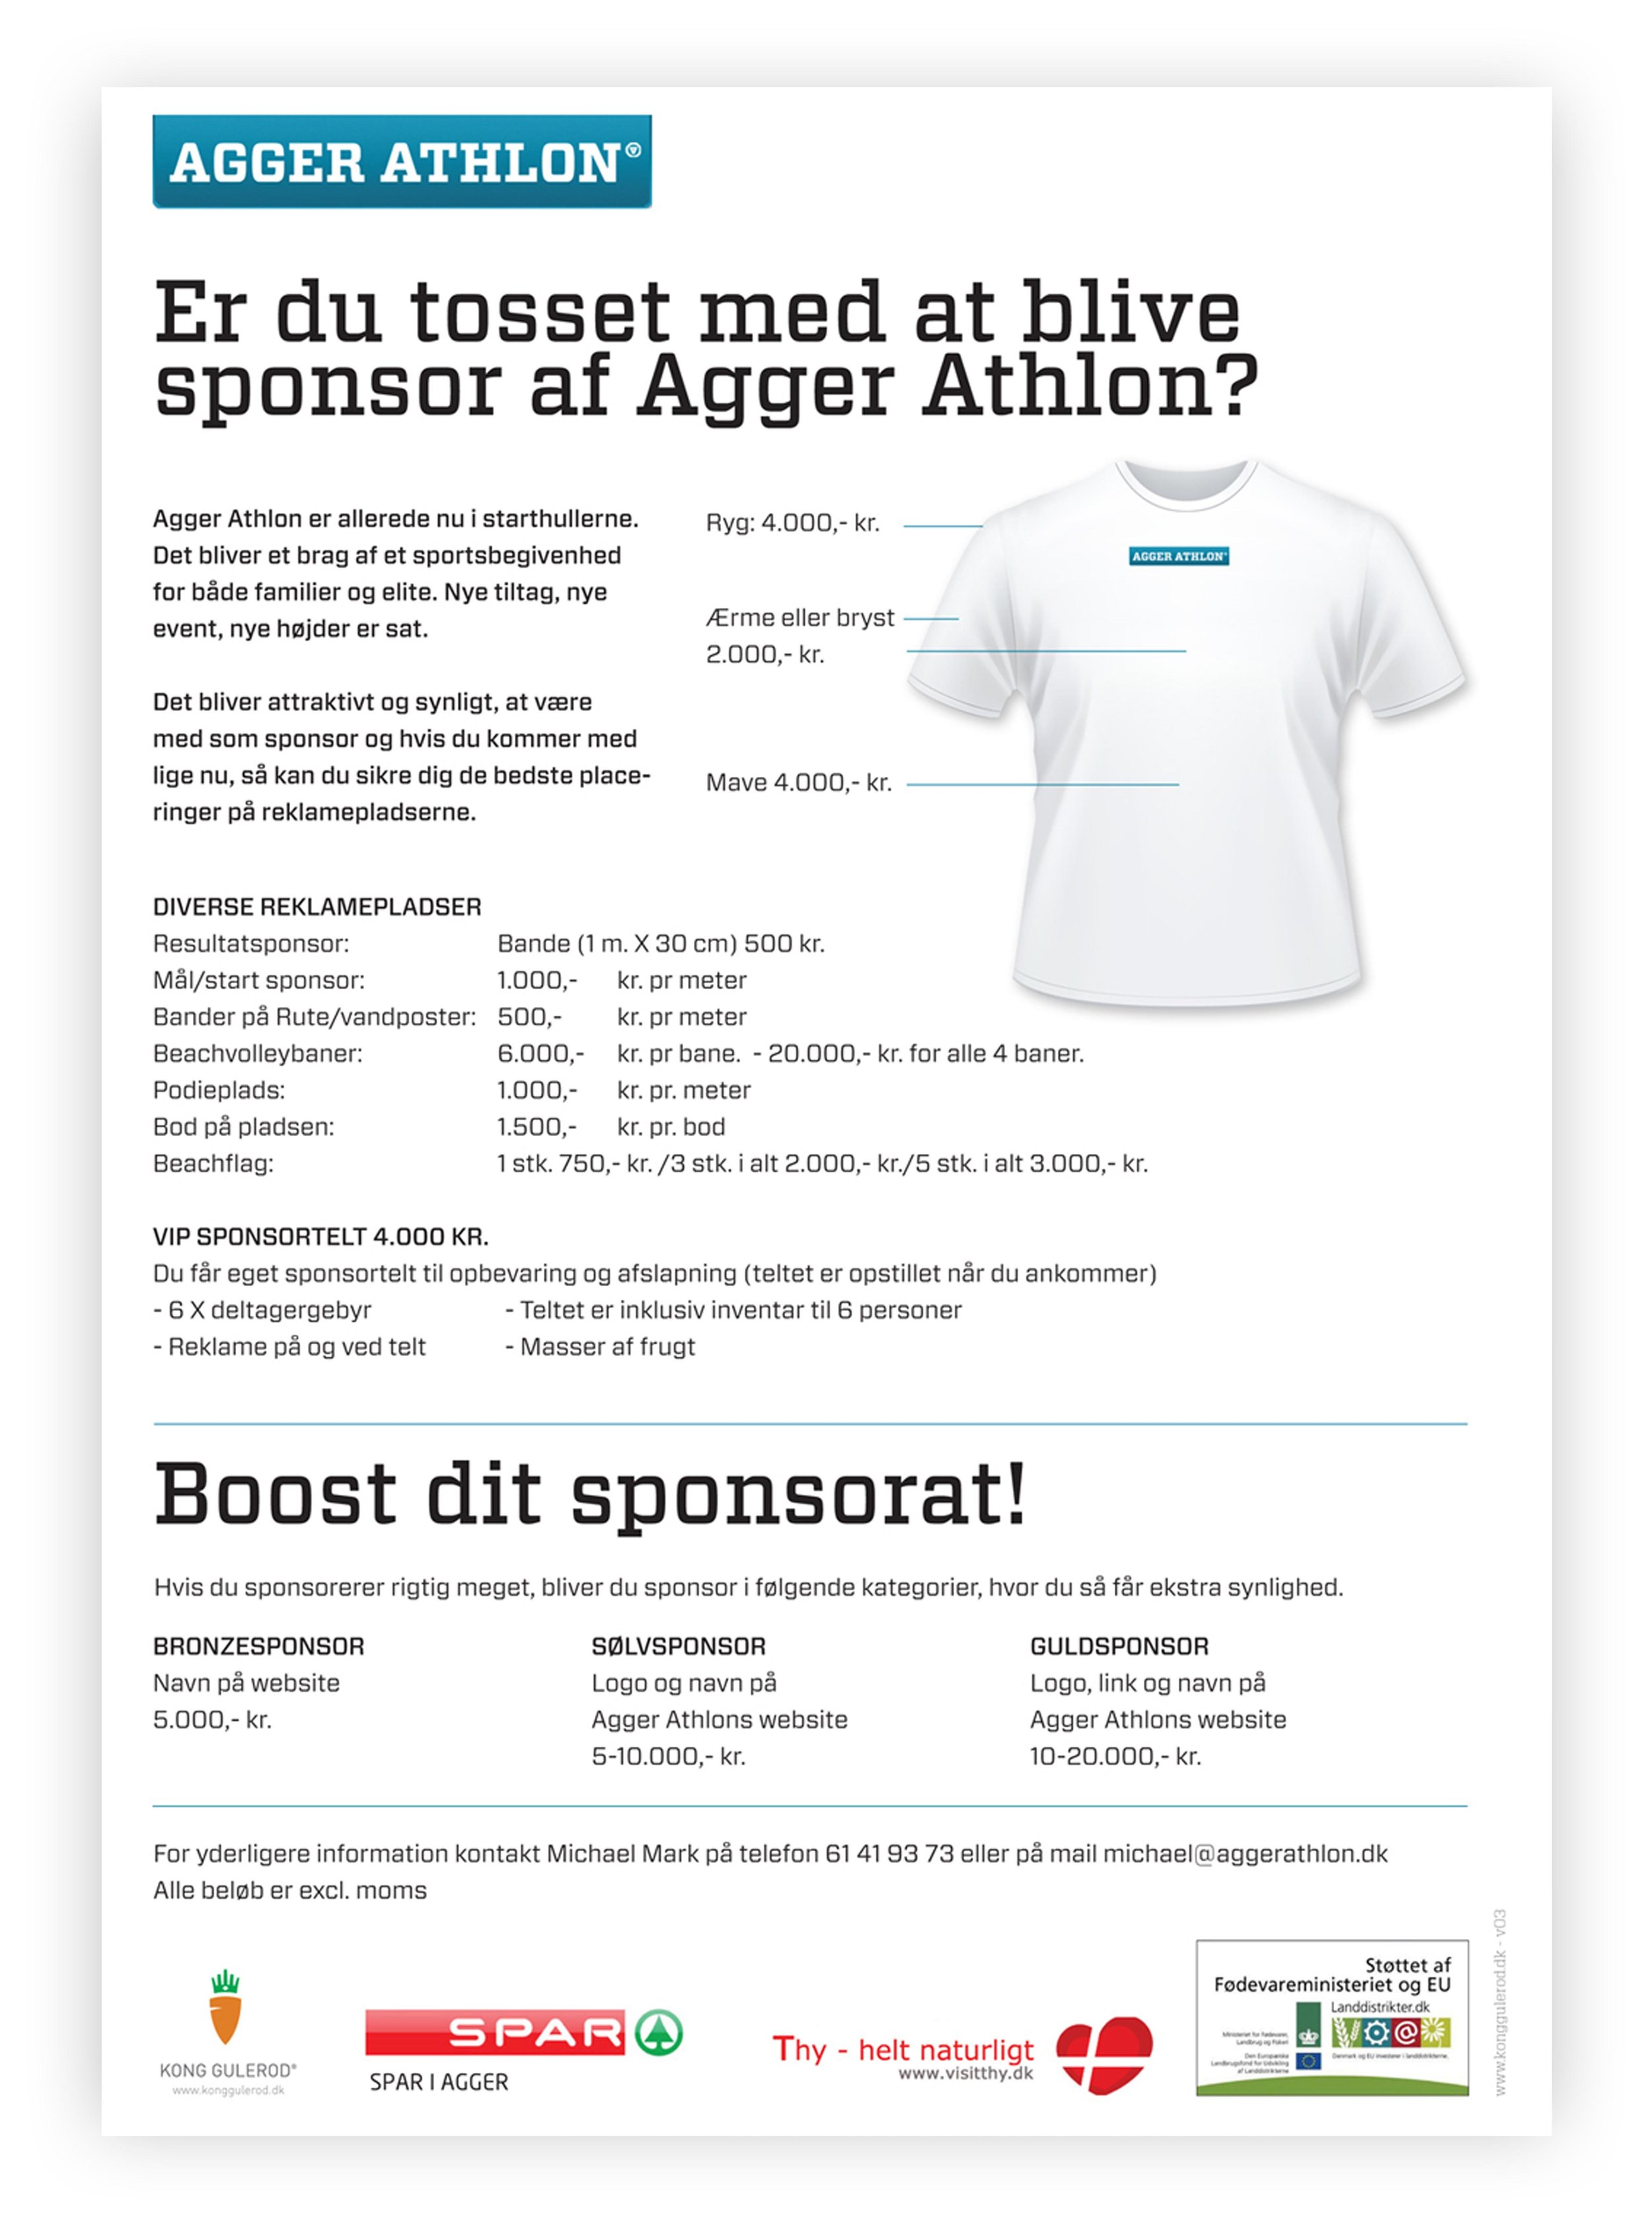 FLYER AGGER ATHLON 01.jpg